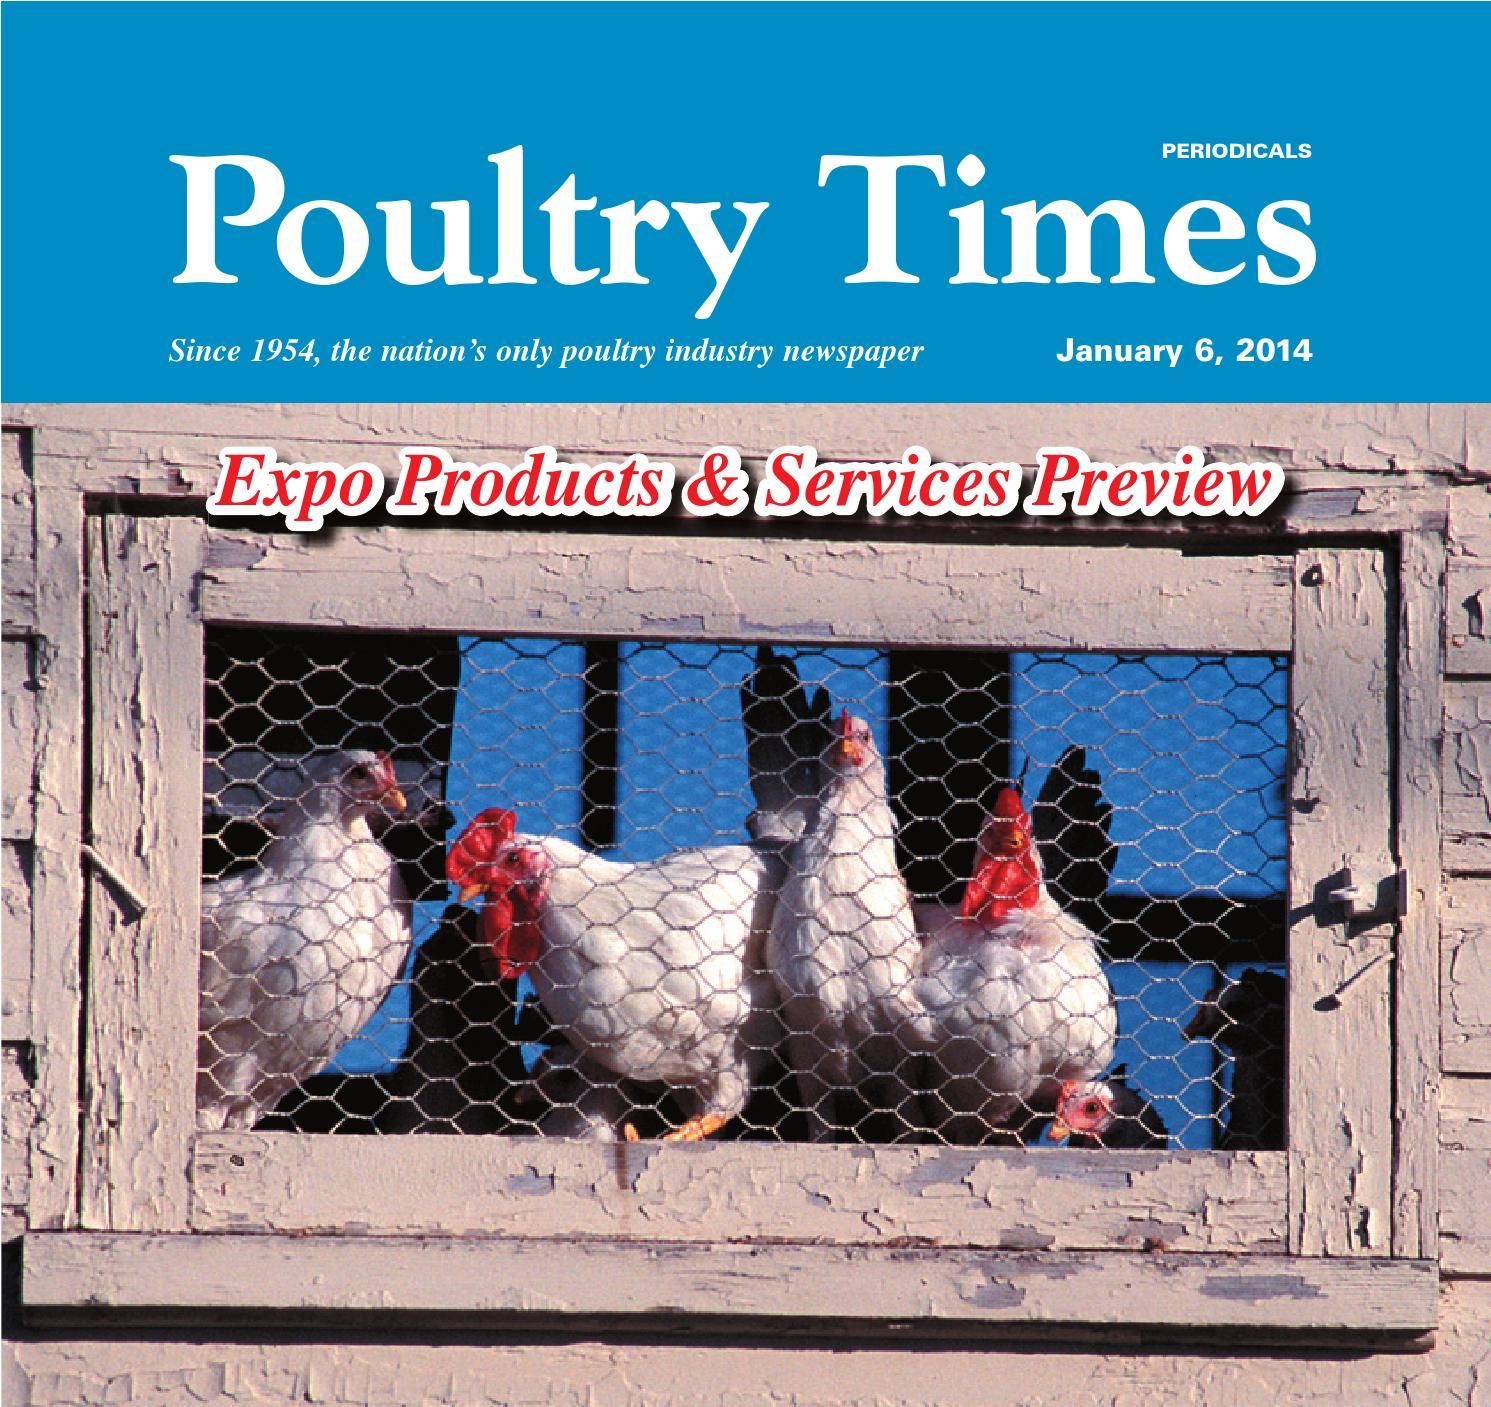 Ventilation system poultry breeder house north ireland opticon agri - Ventilation System Poultry Breeder House North Ireland Opticon Agri 3